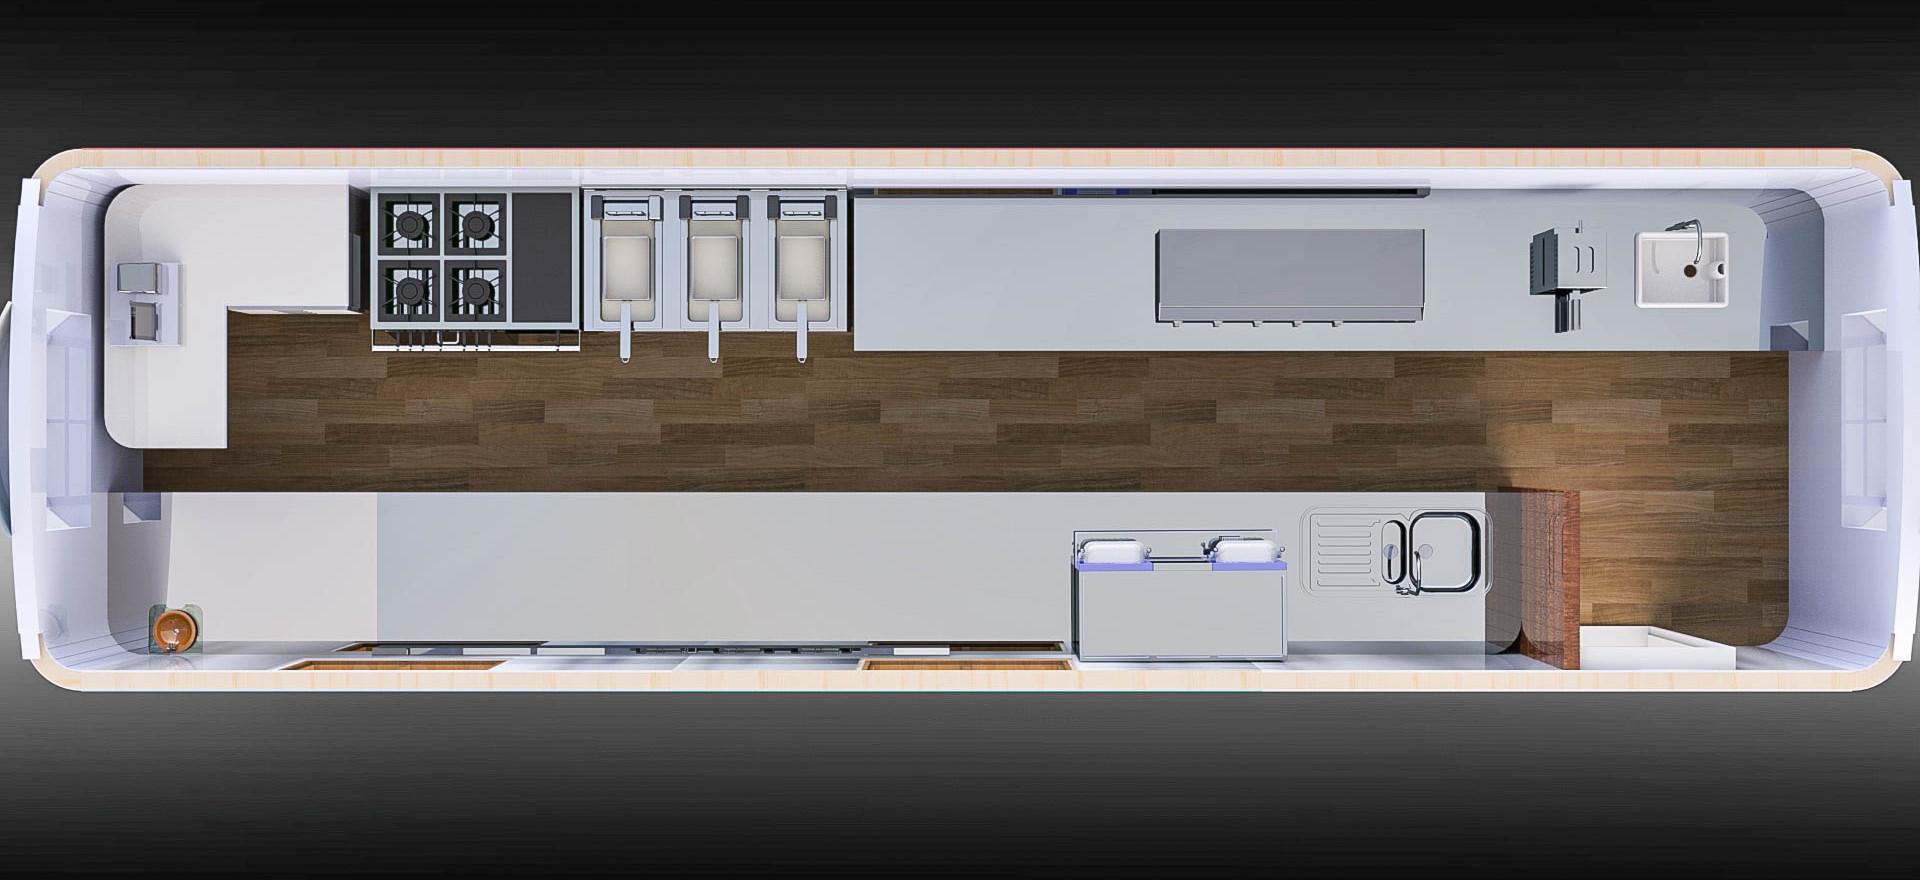 Catering Floor Plan.jpg